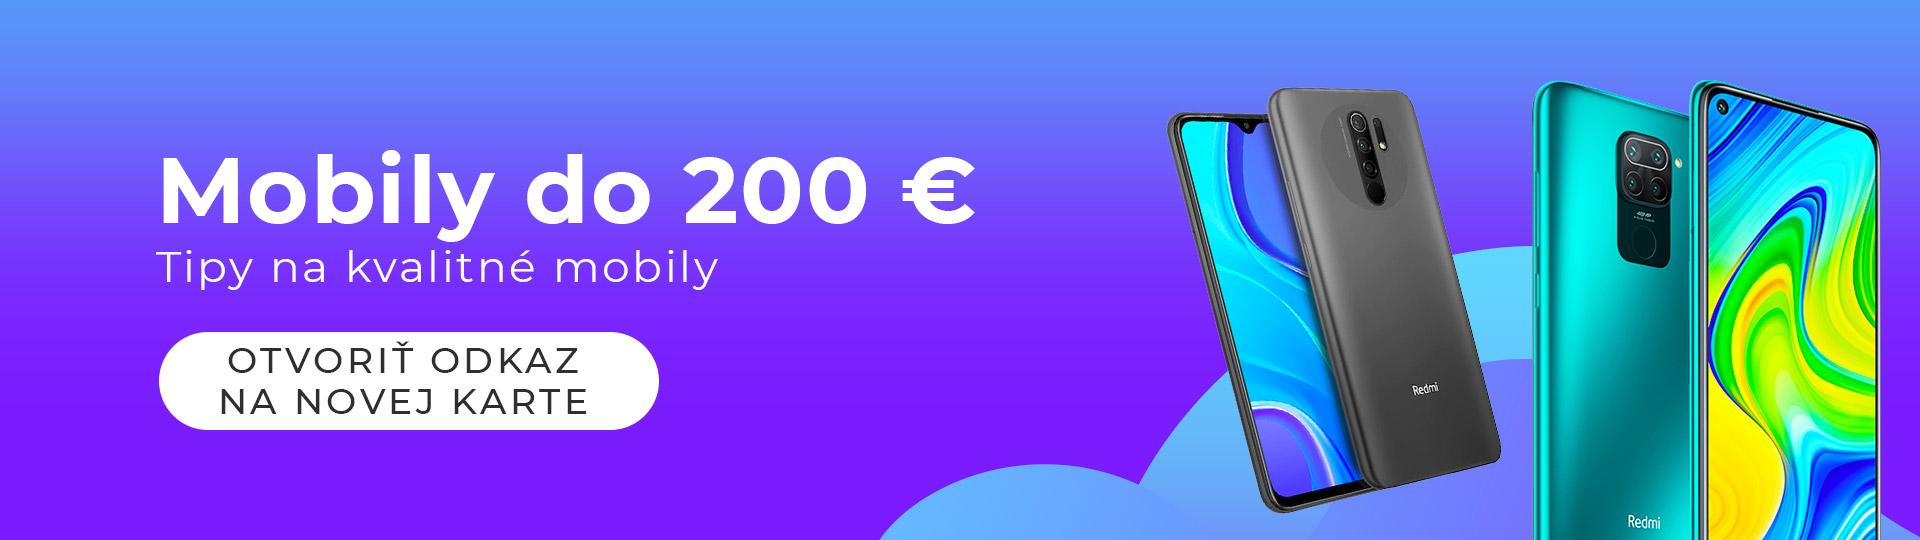 Mobily do 200 eur